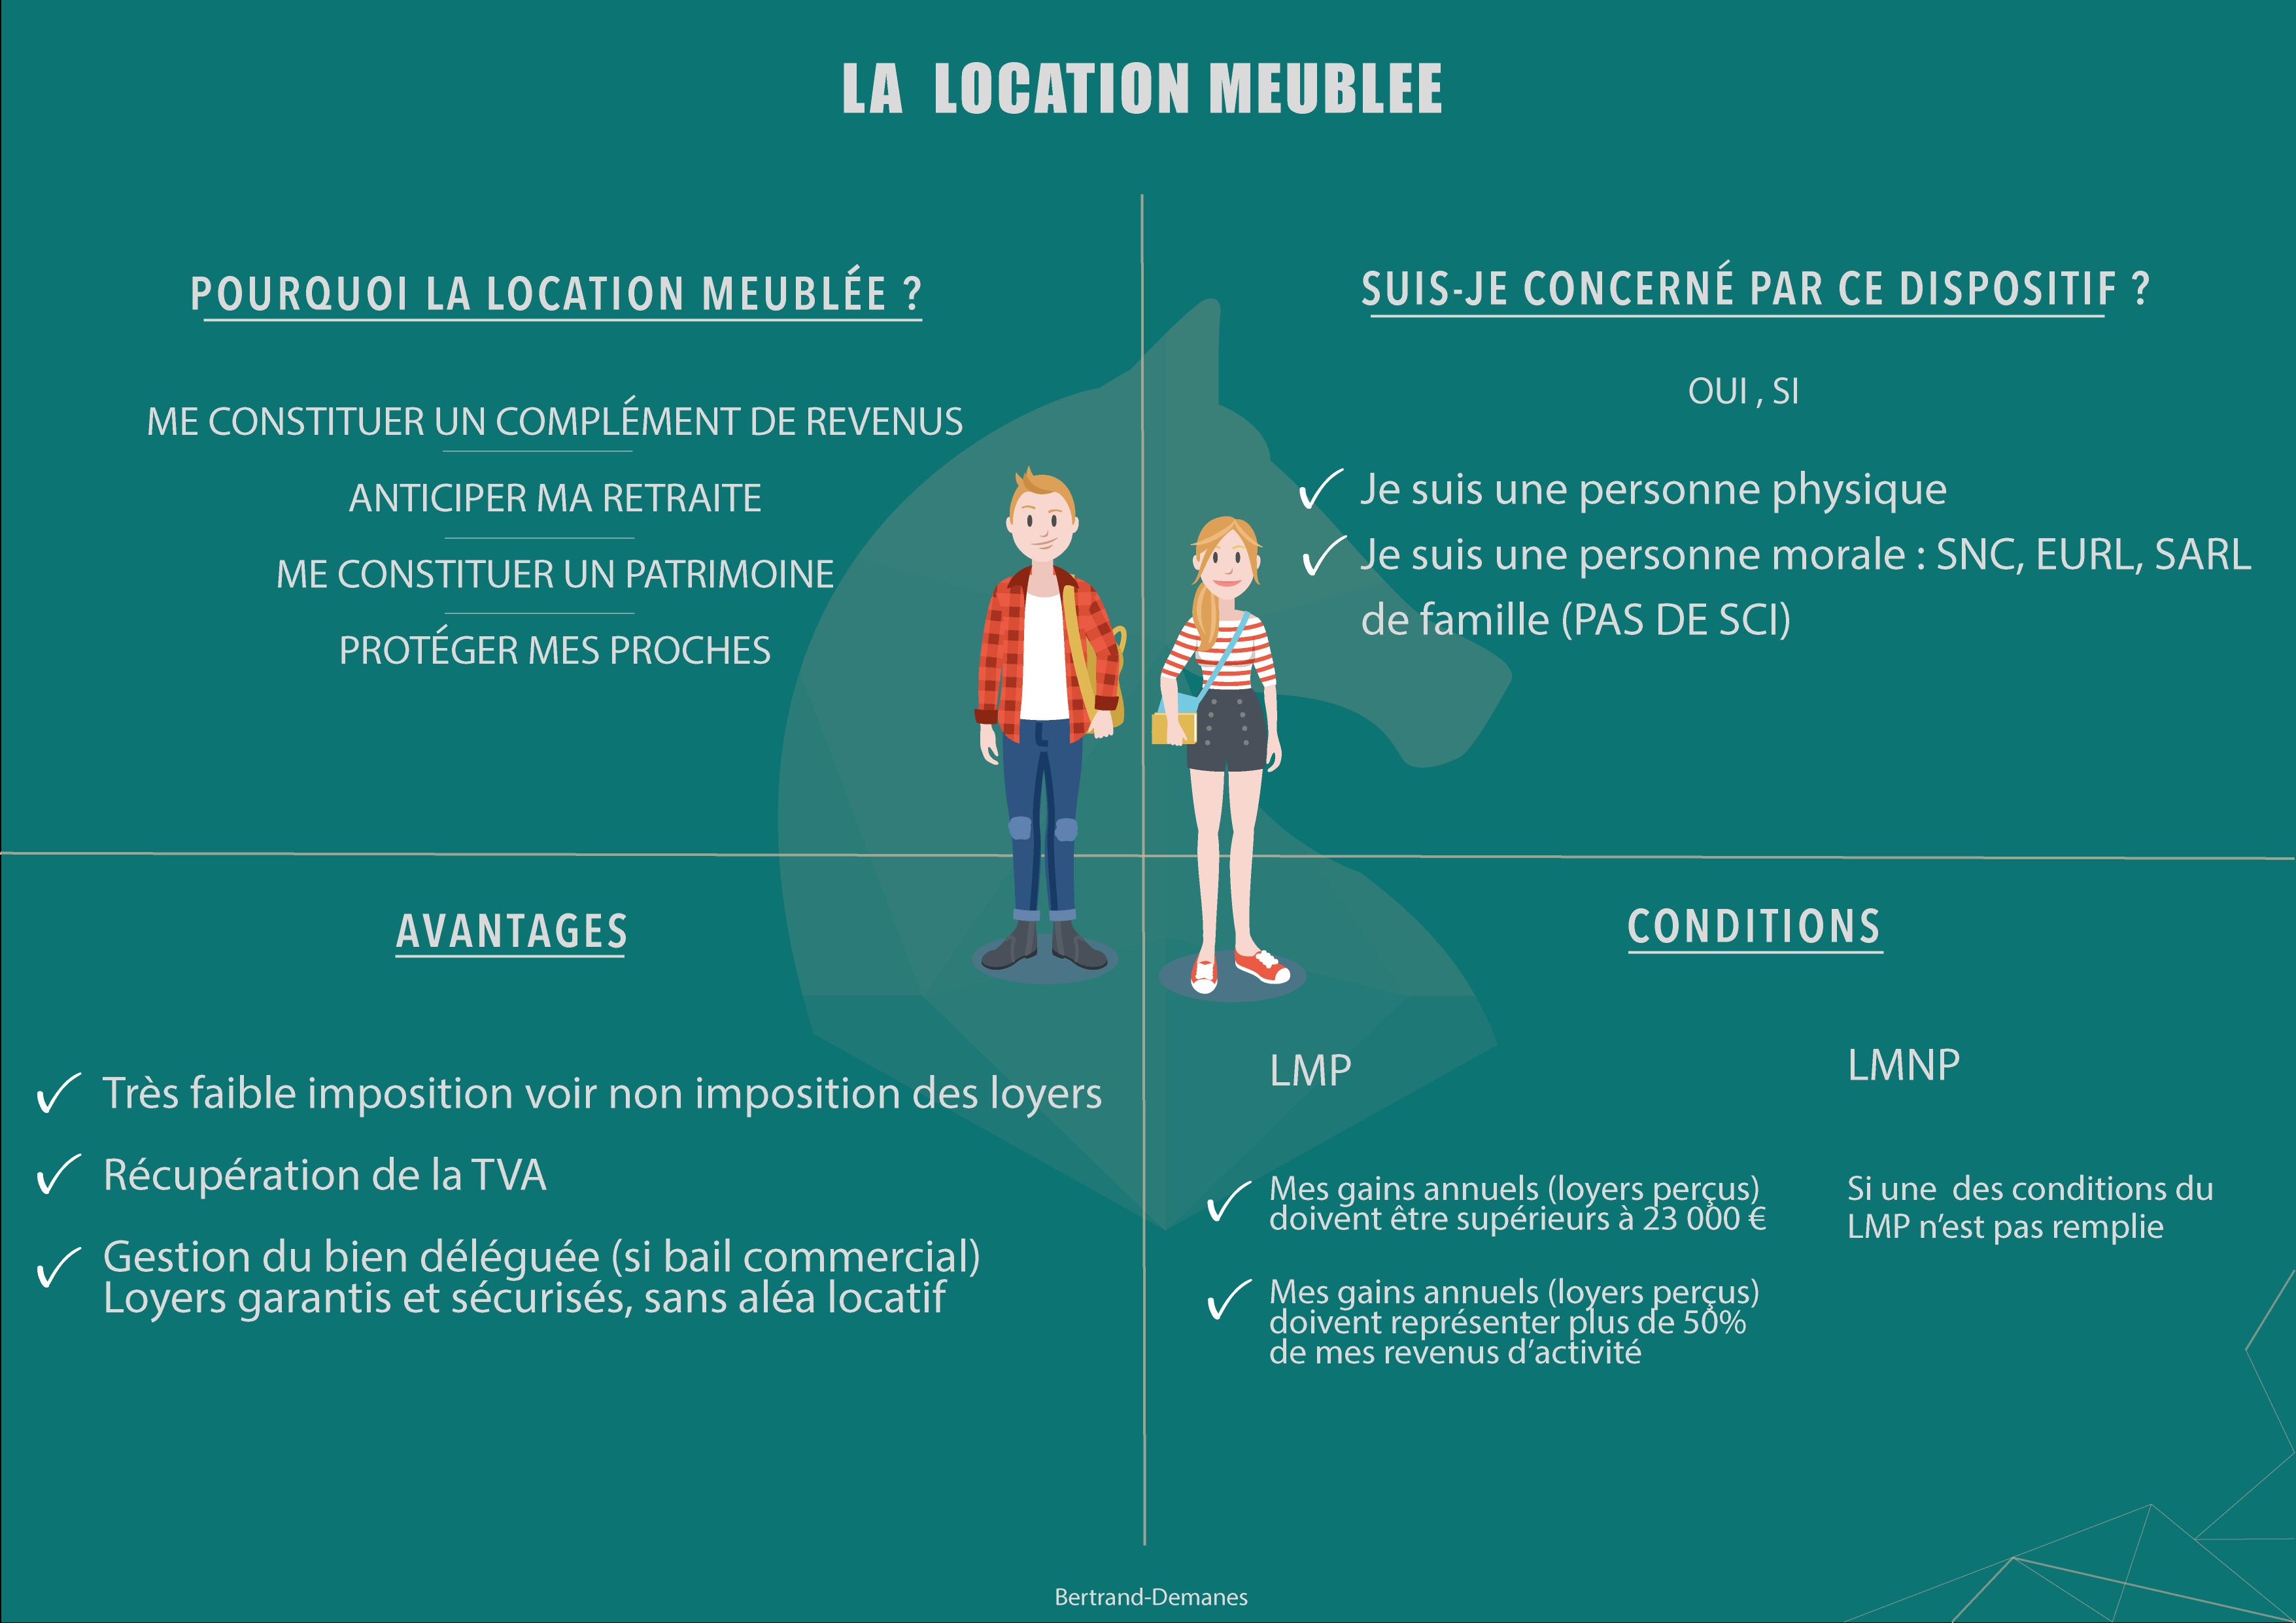 infographie-location-meublee-lyon-bertrand-demanes